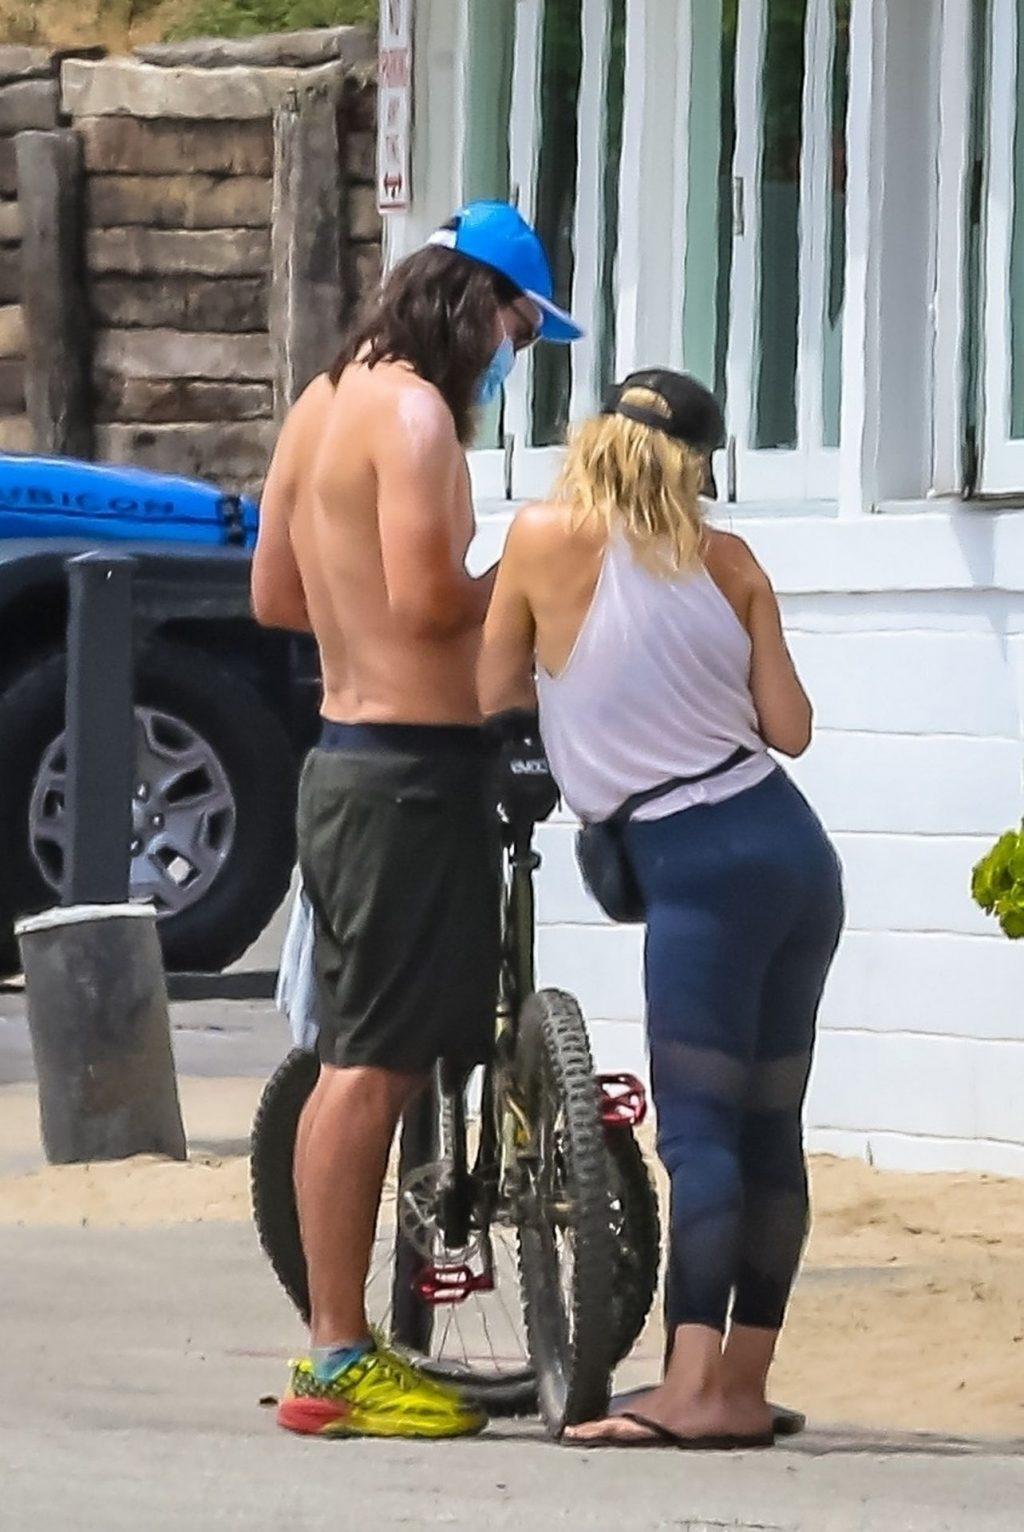 Kate Hudson Shows Her Pokies While Riding a Bike in Malibu (41 Photos)